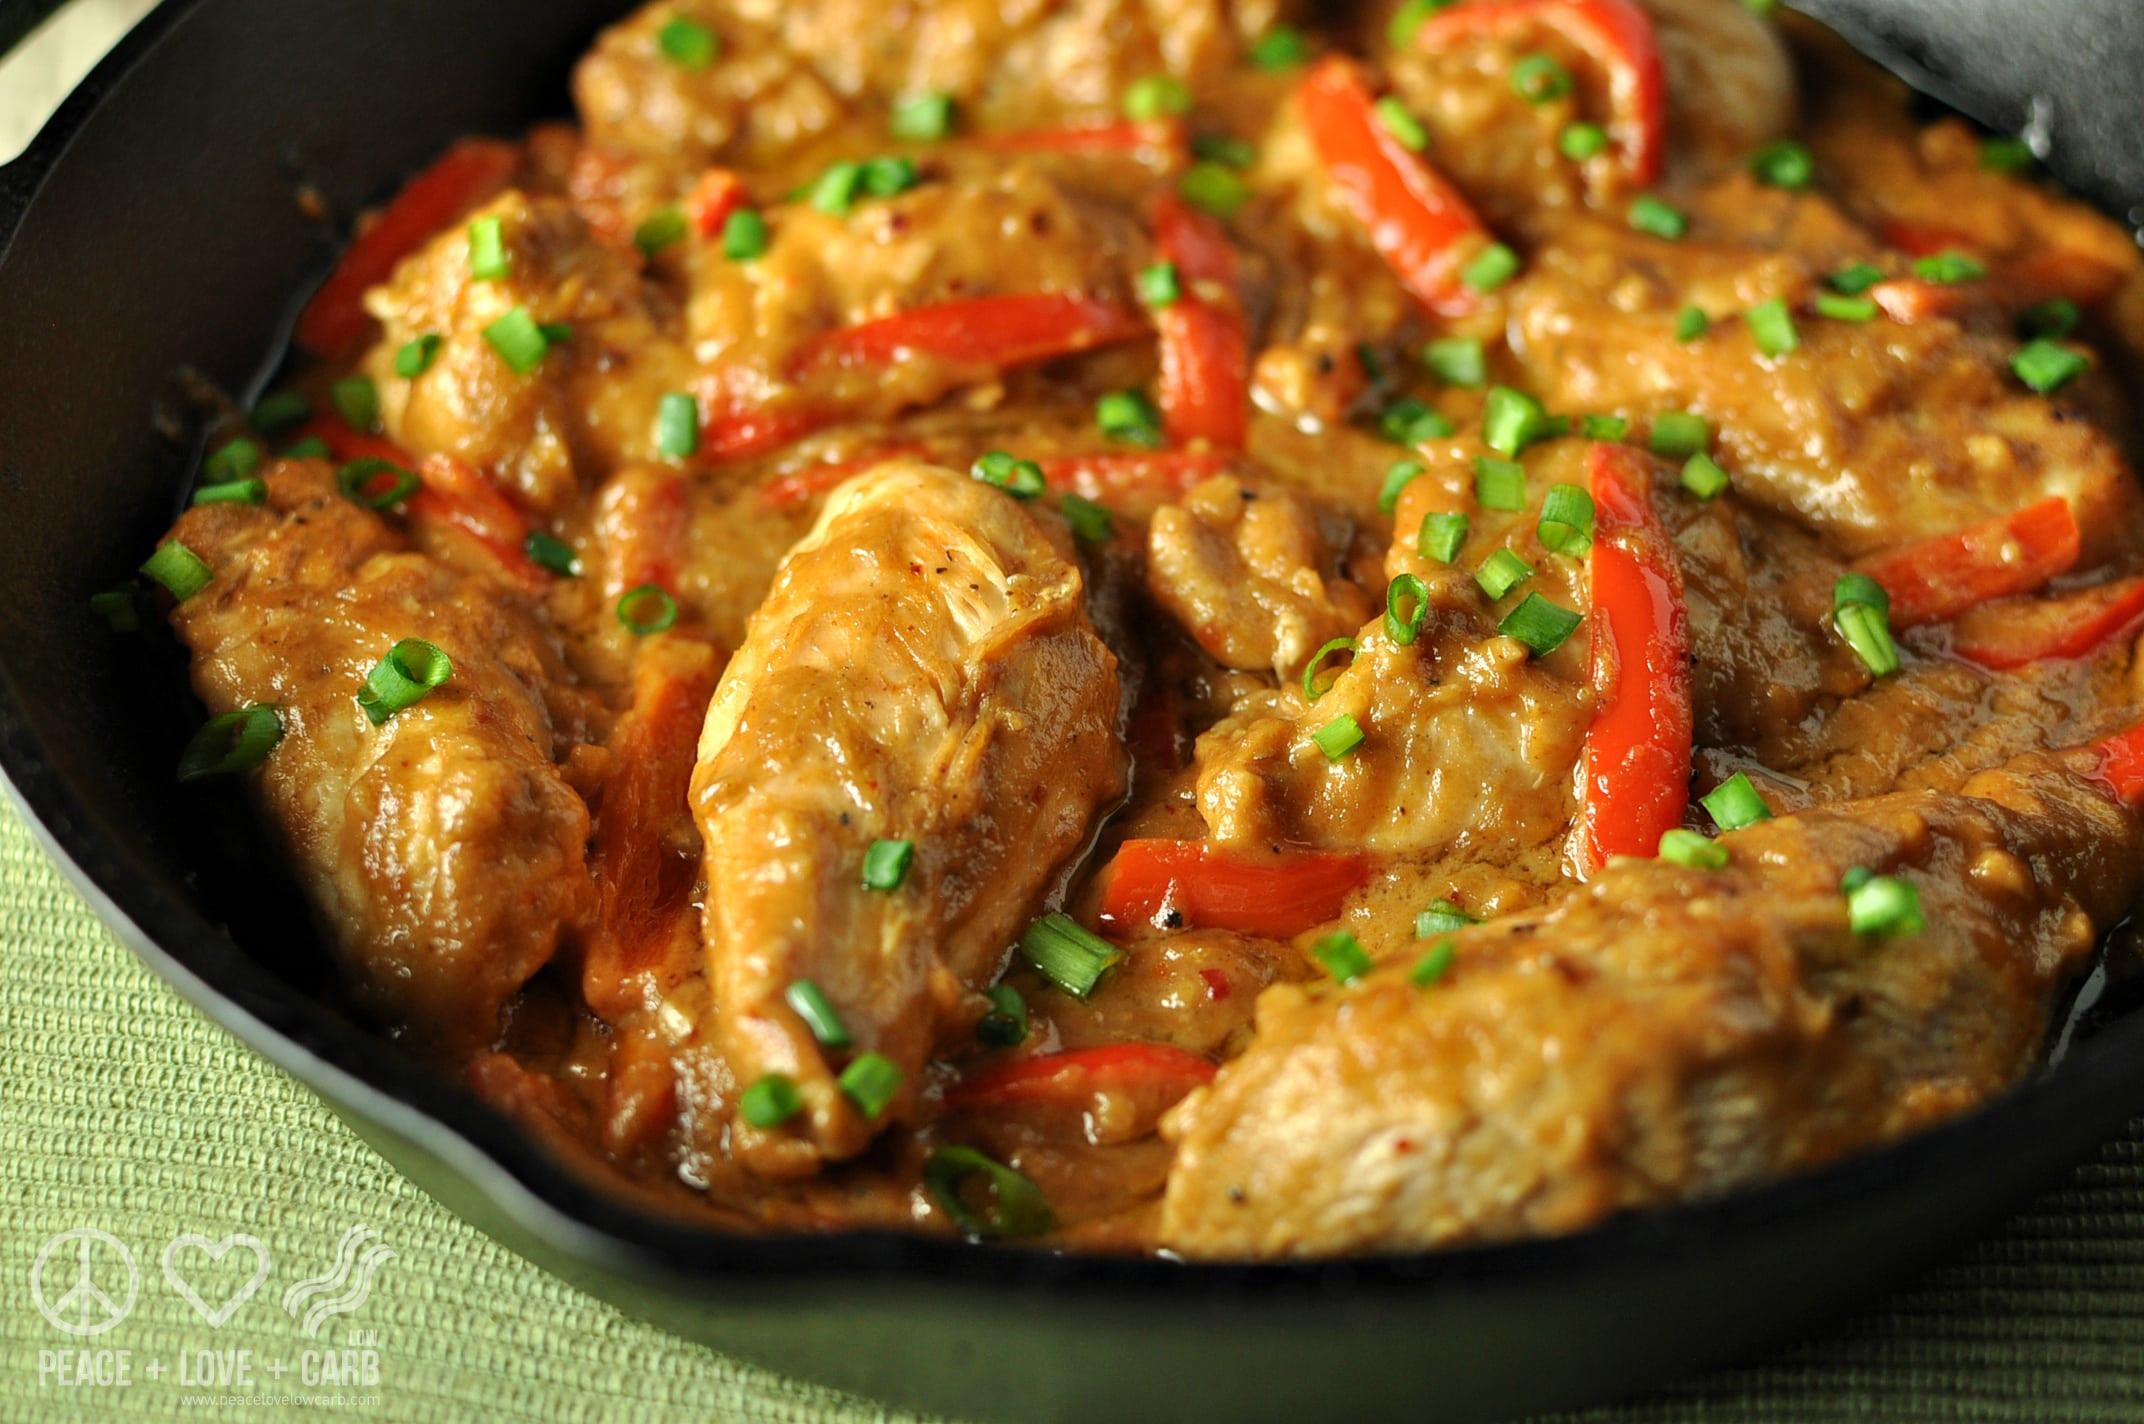 Low Carb Chicken Skillet Recipes  Low Carb Peanut Chicken Skillet